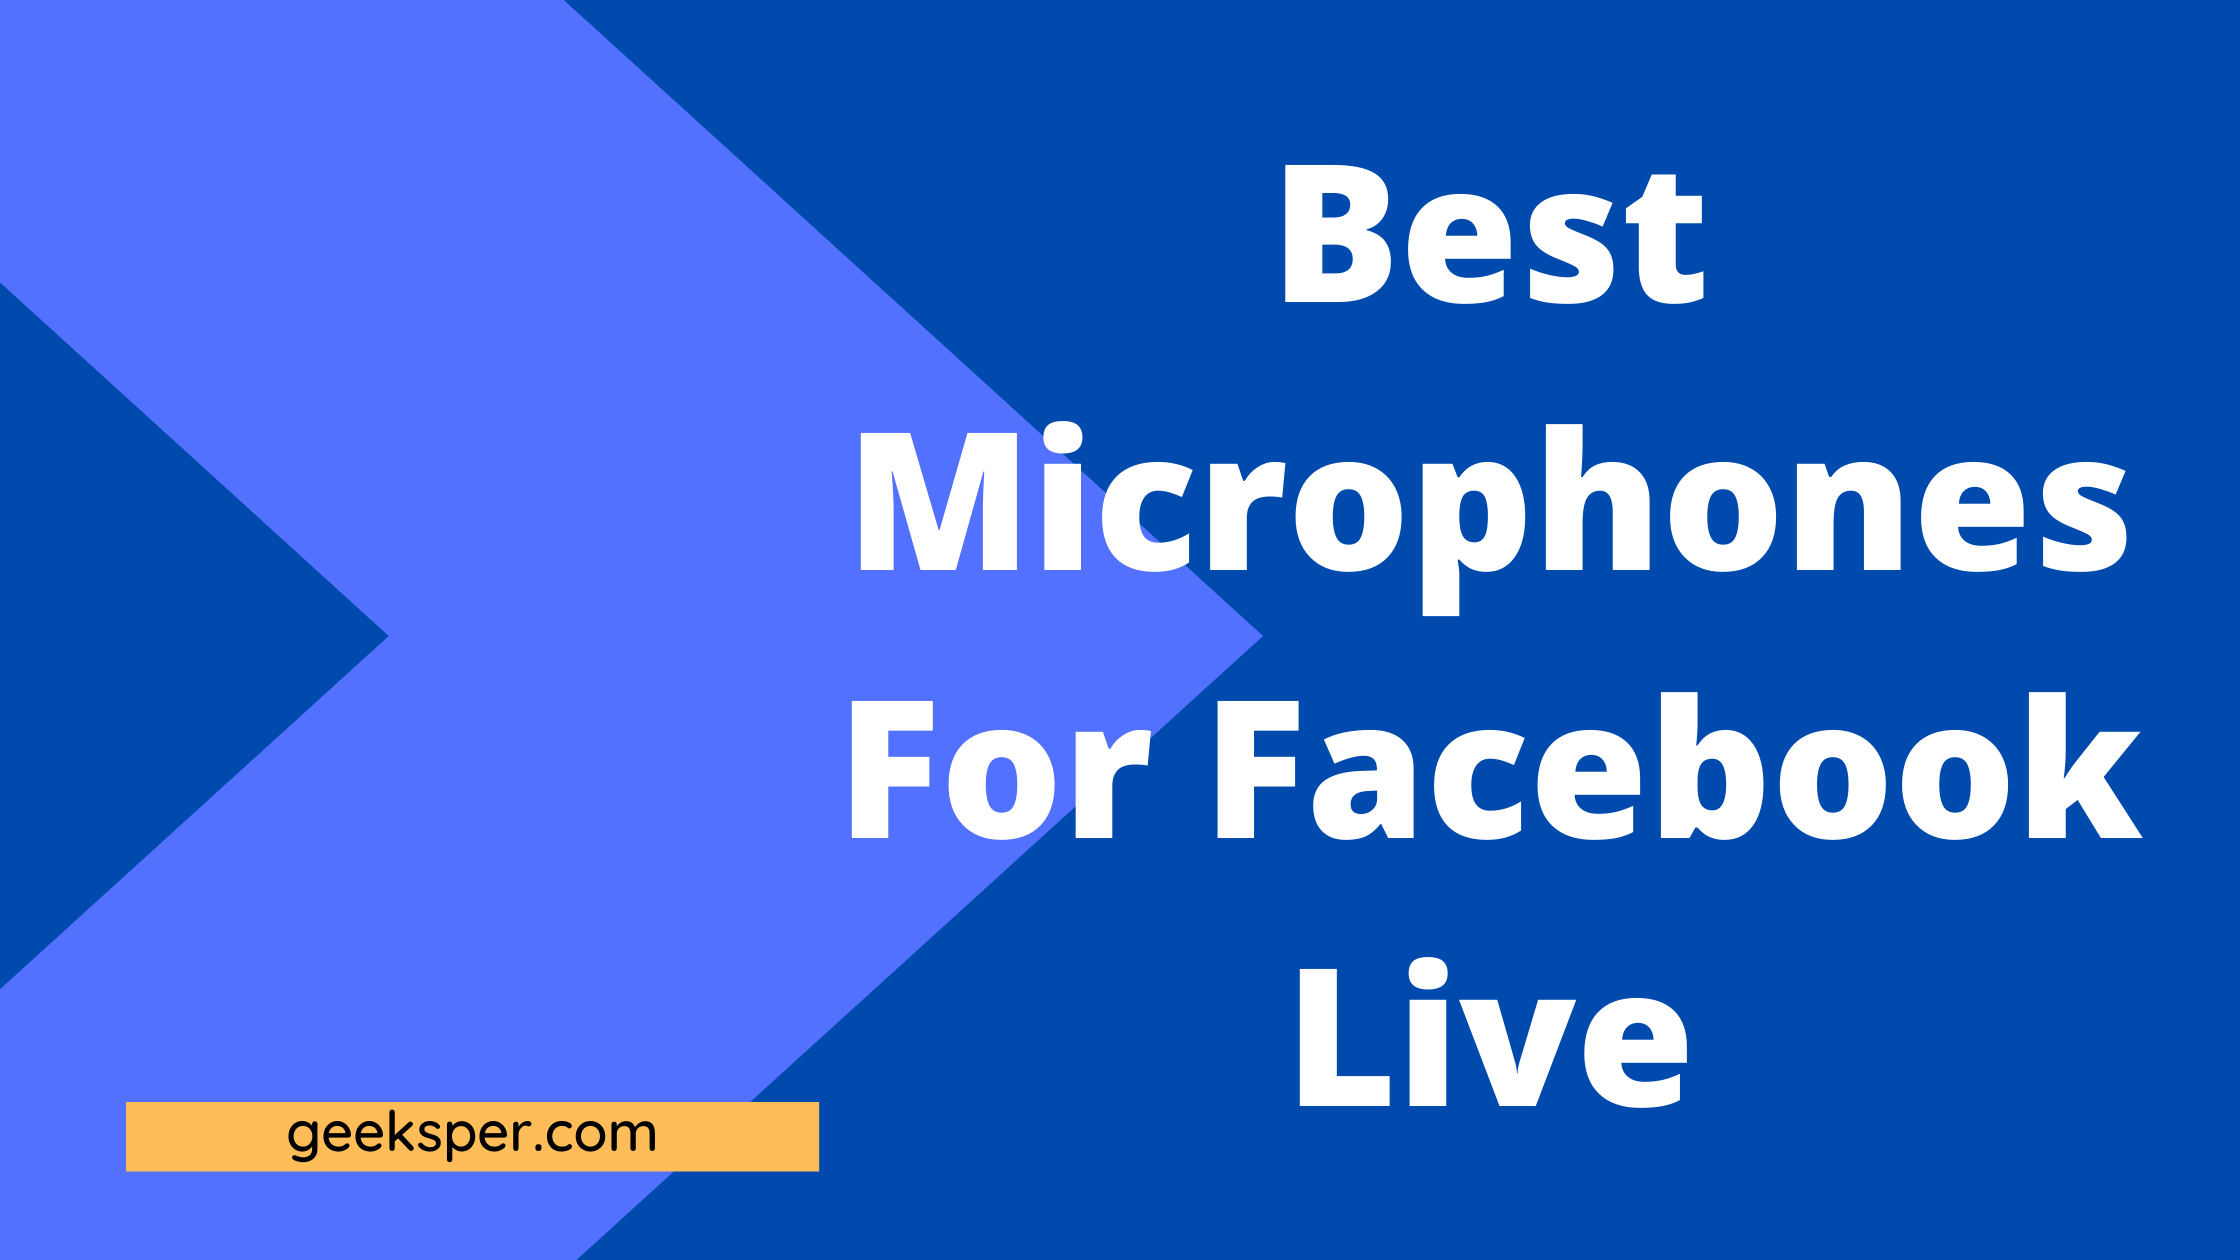 Best Microphones For Facebook Live